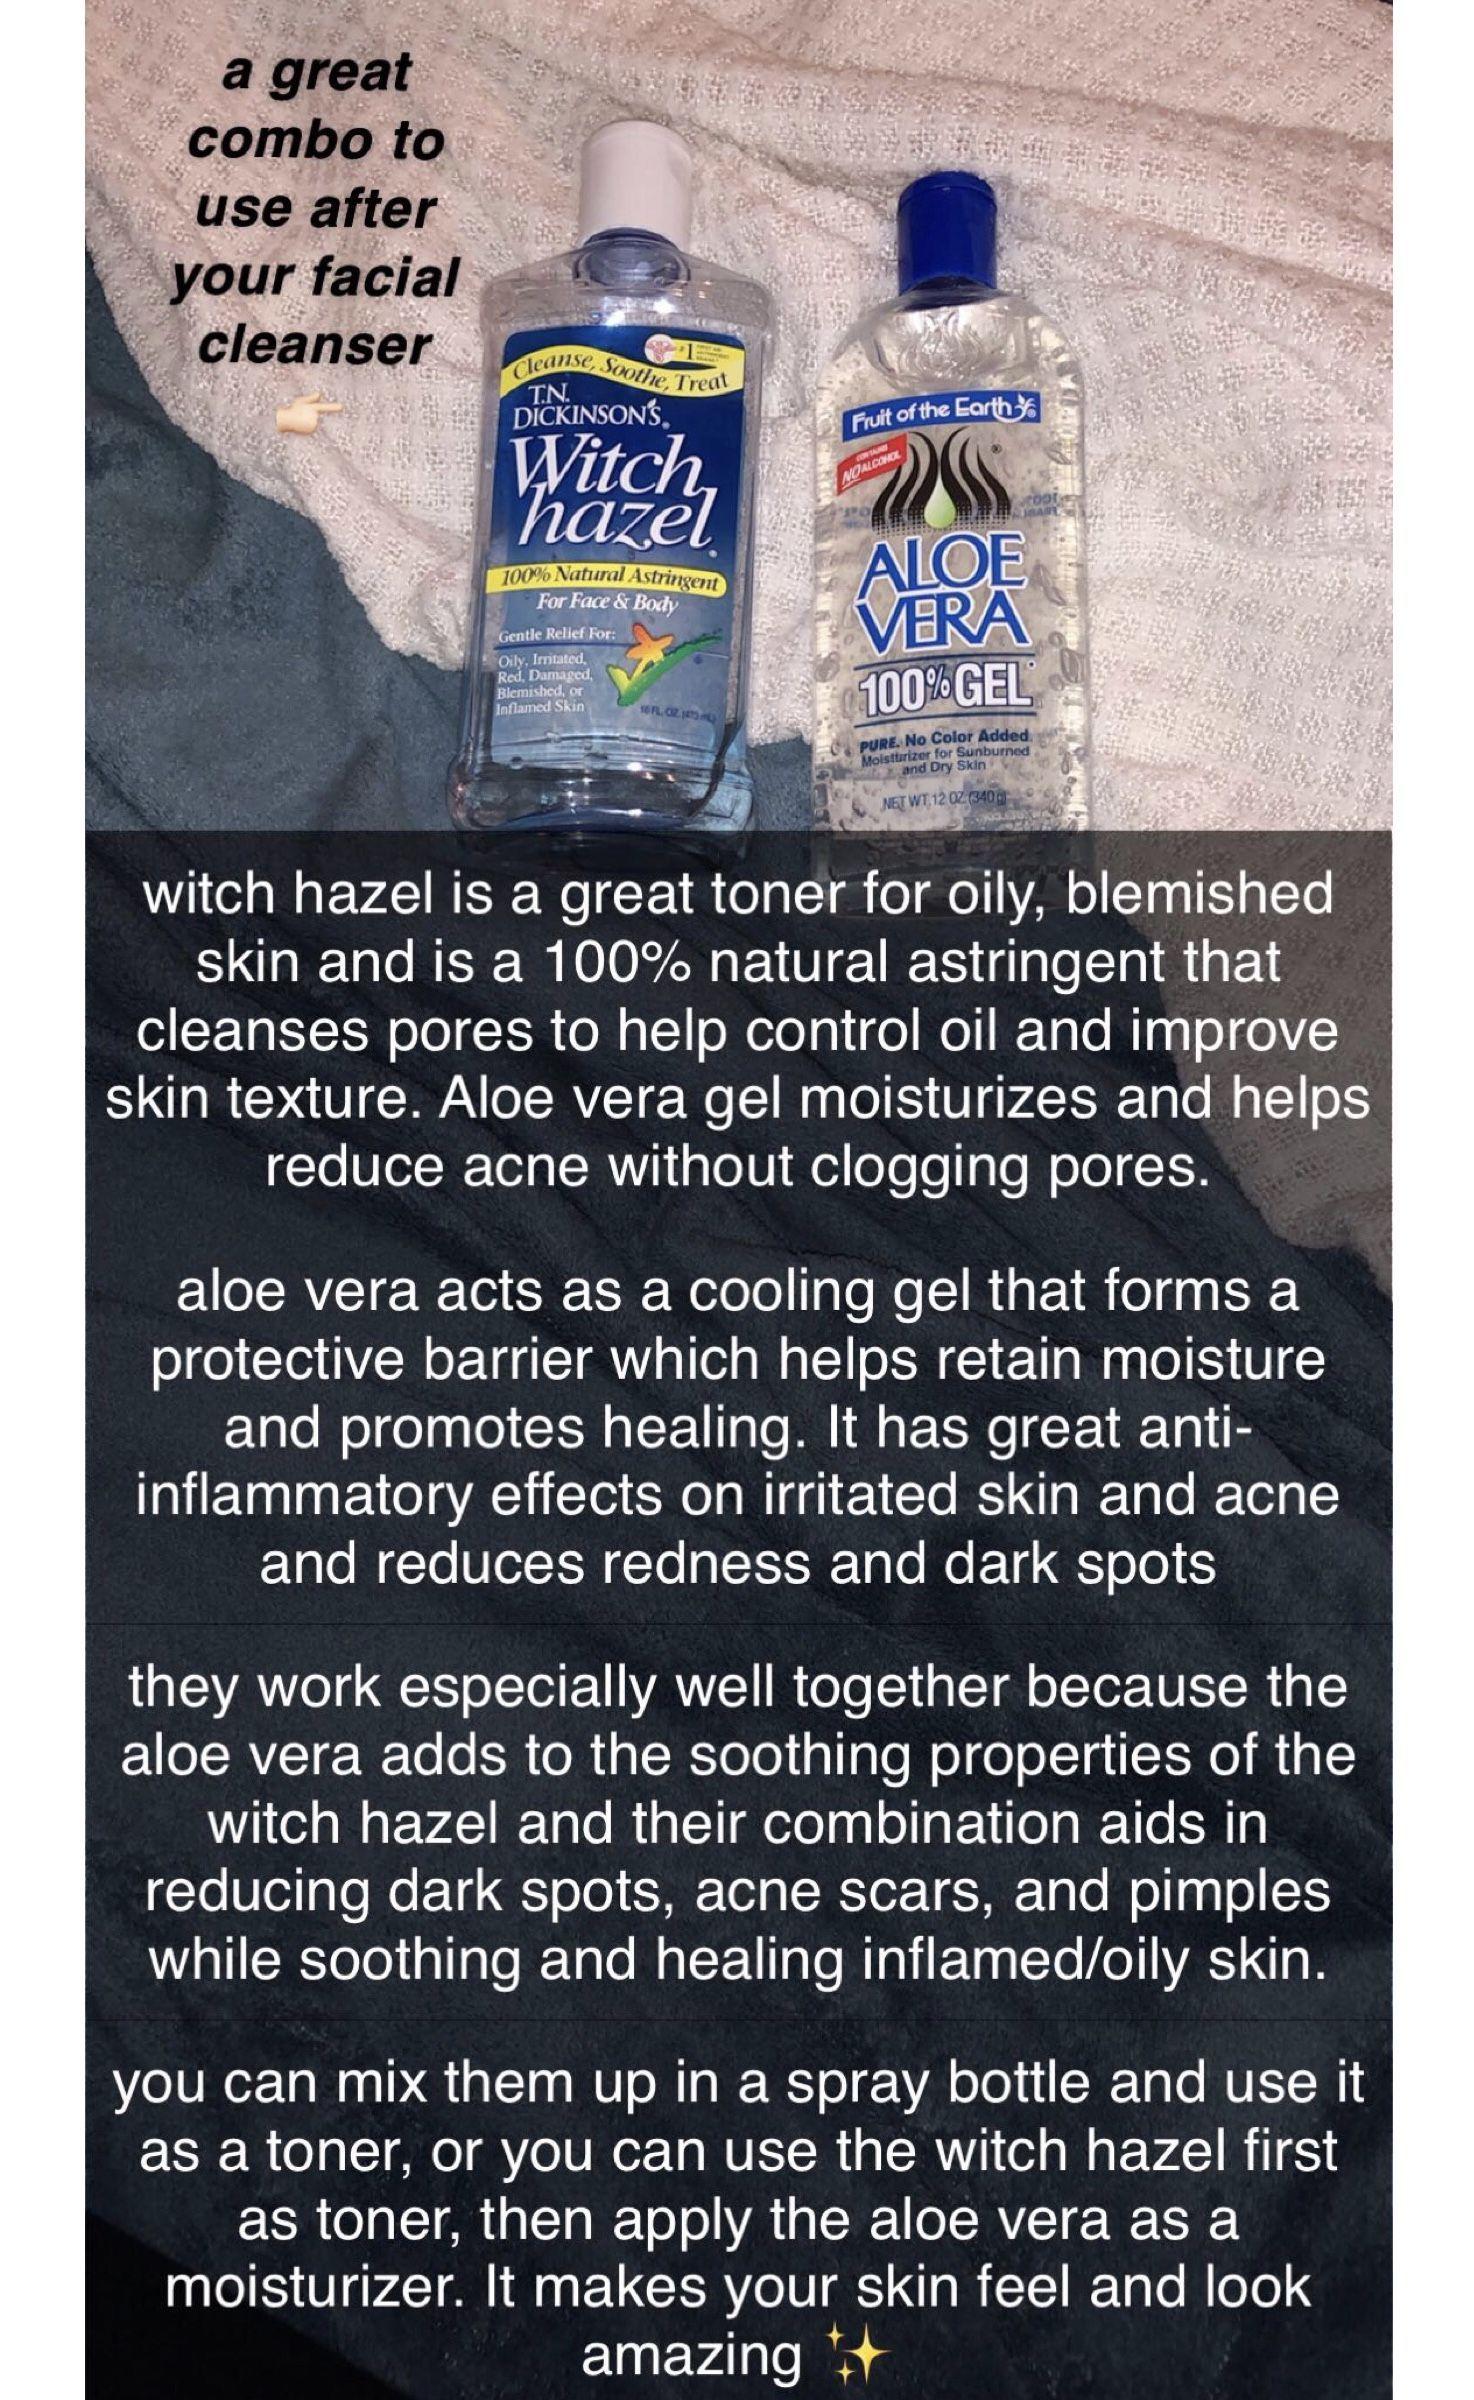 Howtogetridofoilyskin In 2020 Aloe Vera Skin Care Clear Skin Tips Skin